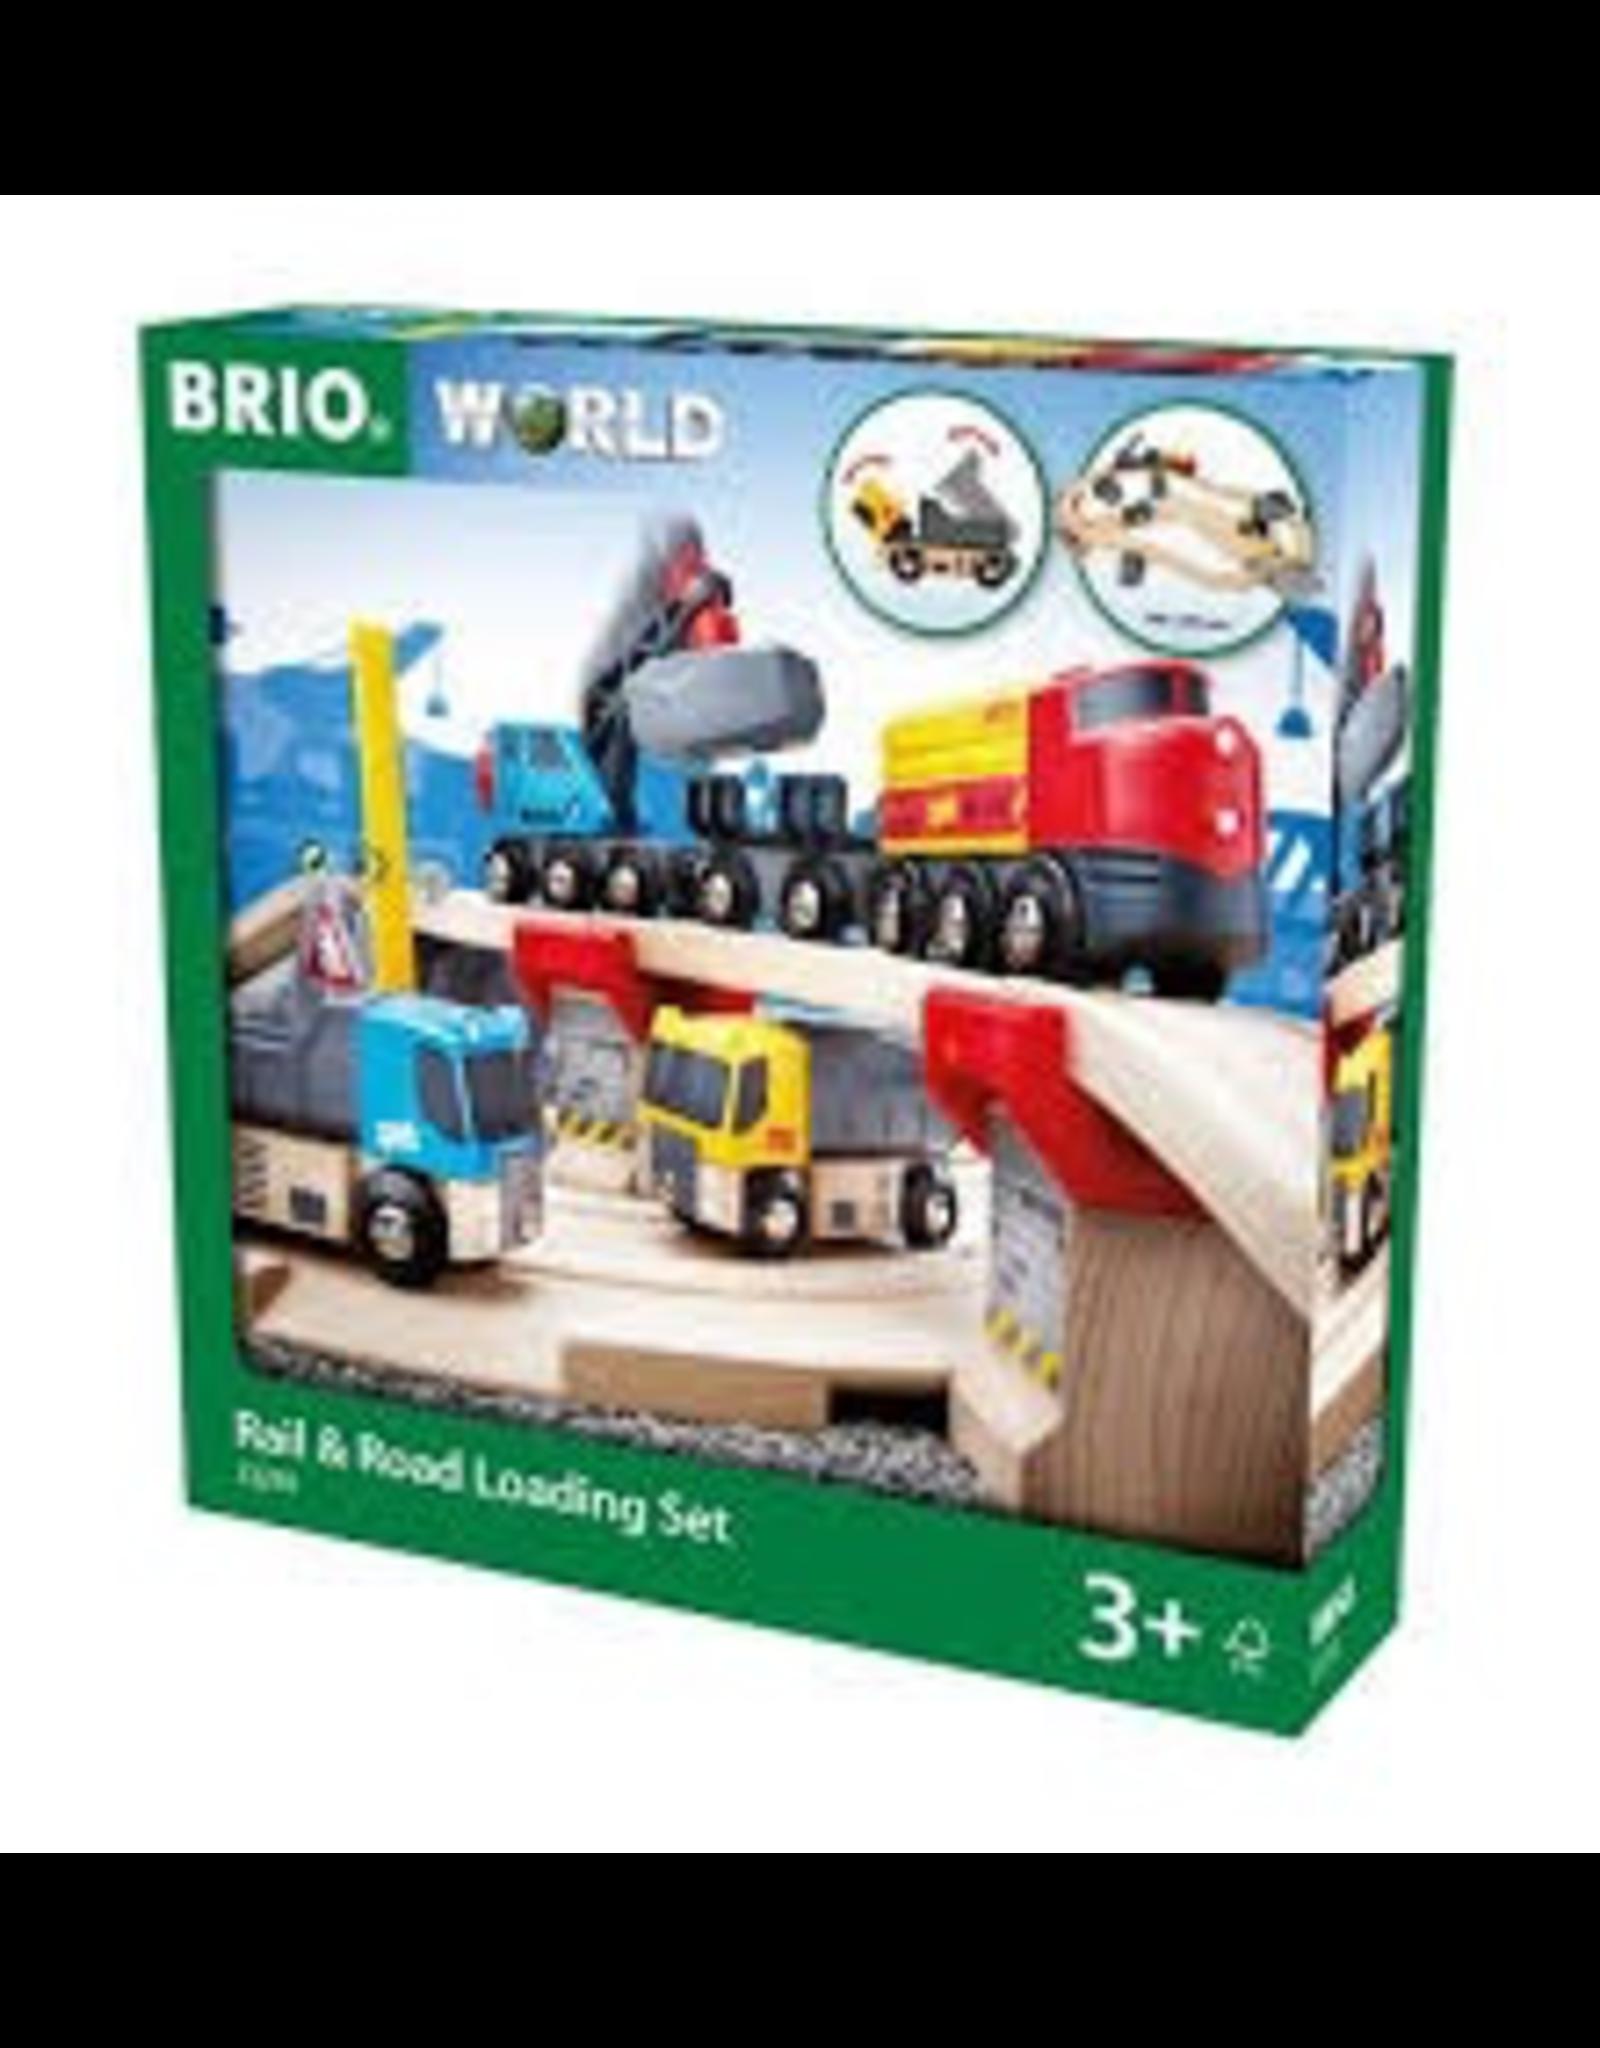 Brio Rail & Road Loading Set